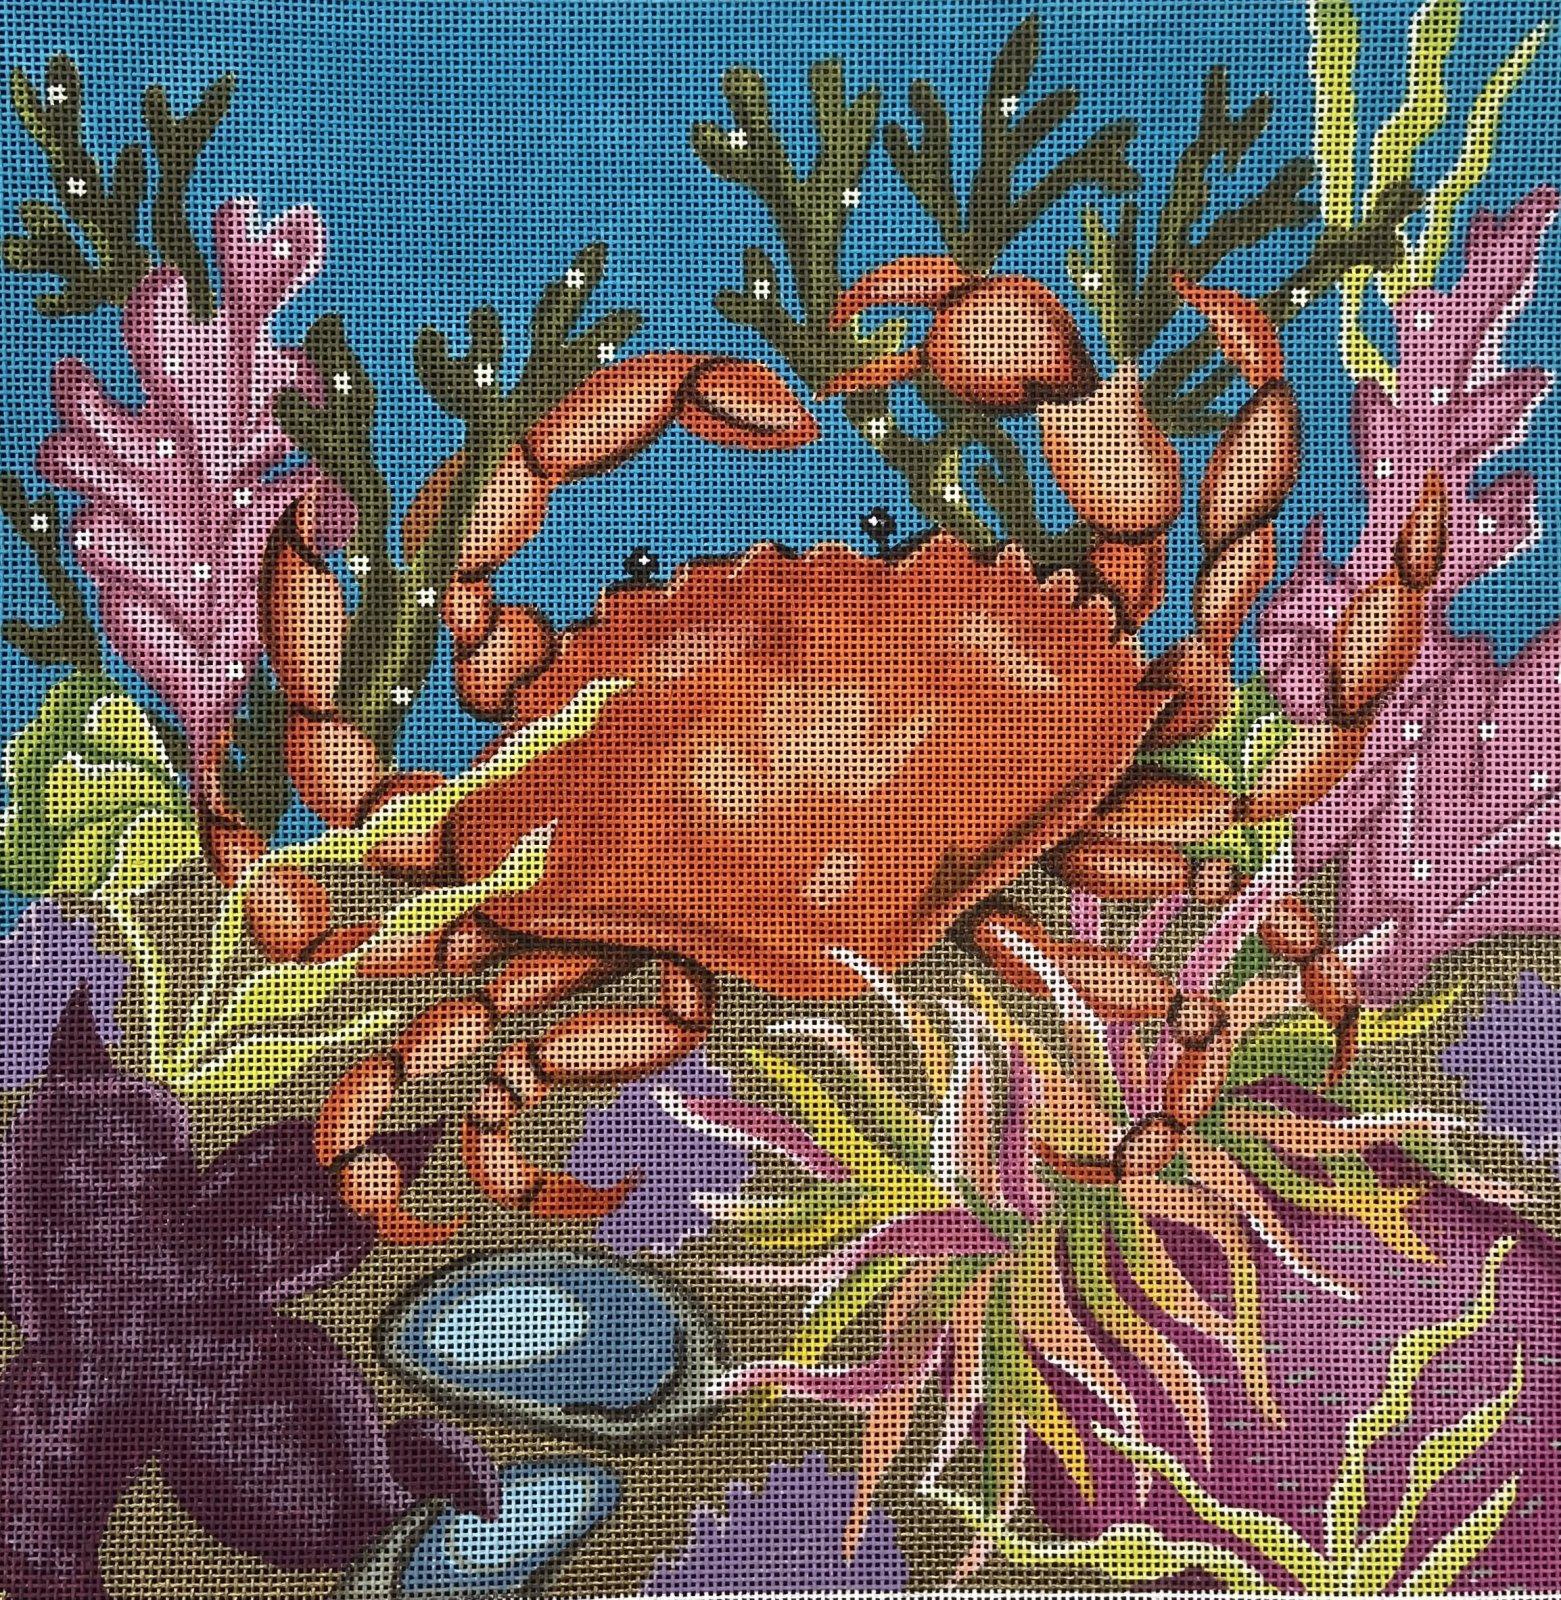 AL035 Coral Reef Crab Valerie Needlepoint Gallery